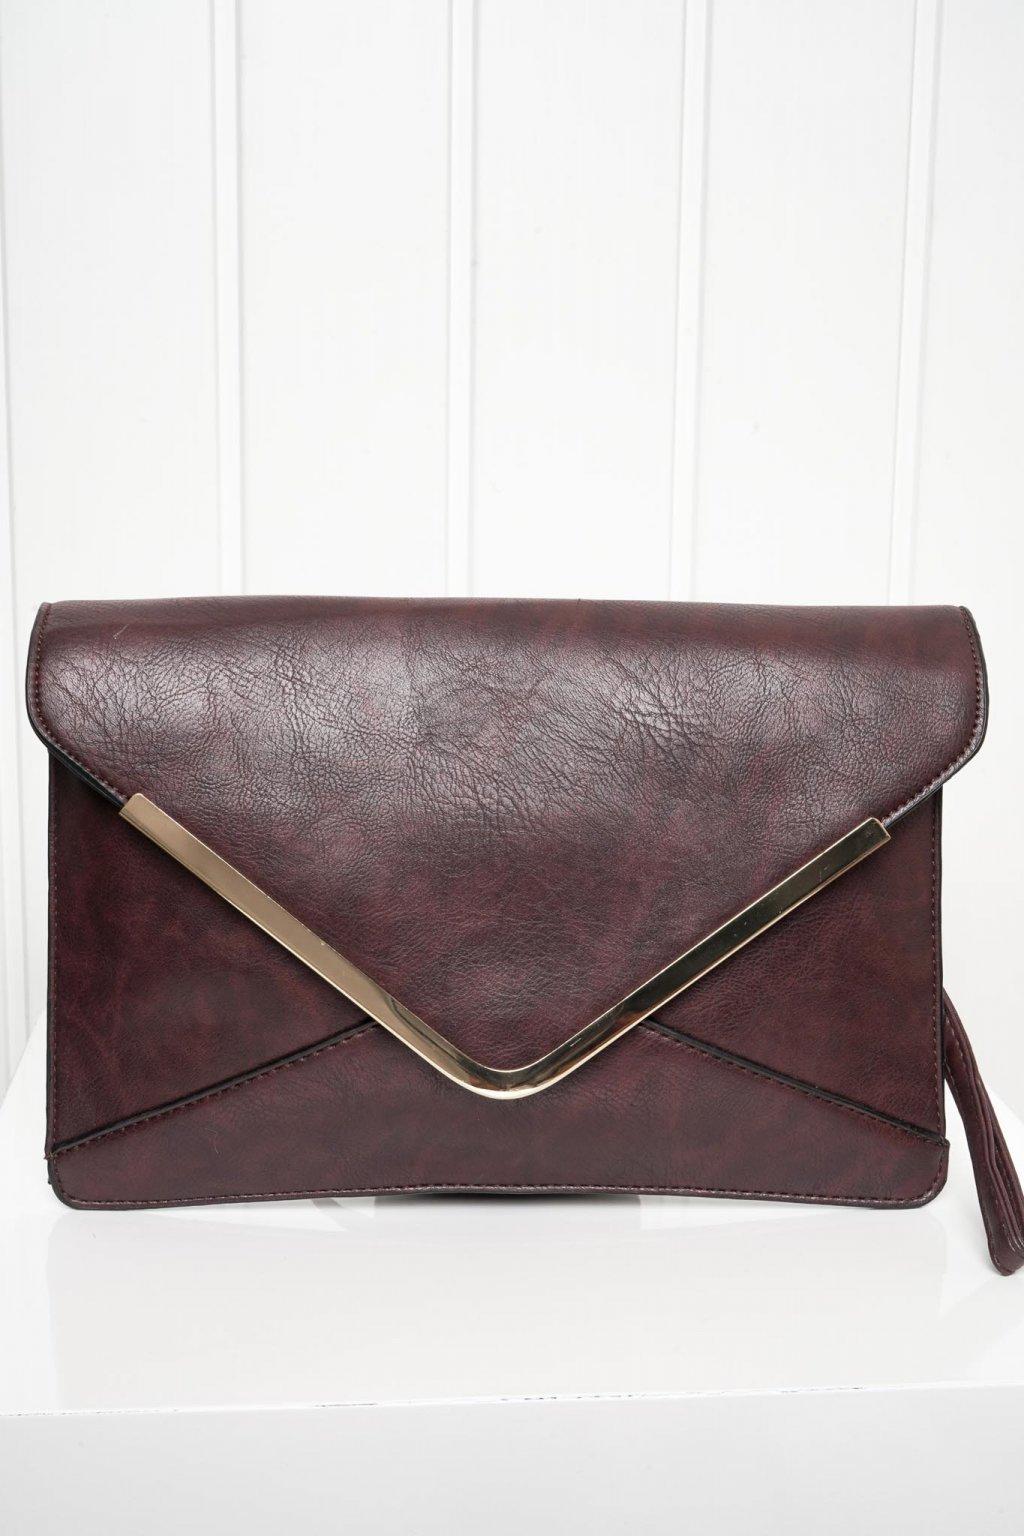 Kabelka, crossbody, ruksak, shopping bag, shopperka, 599